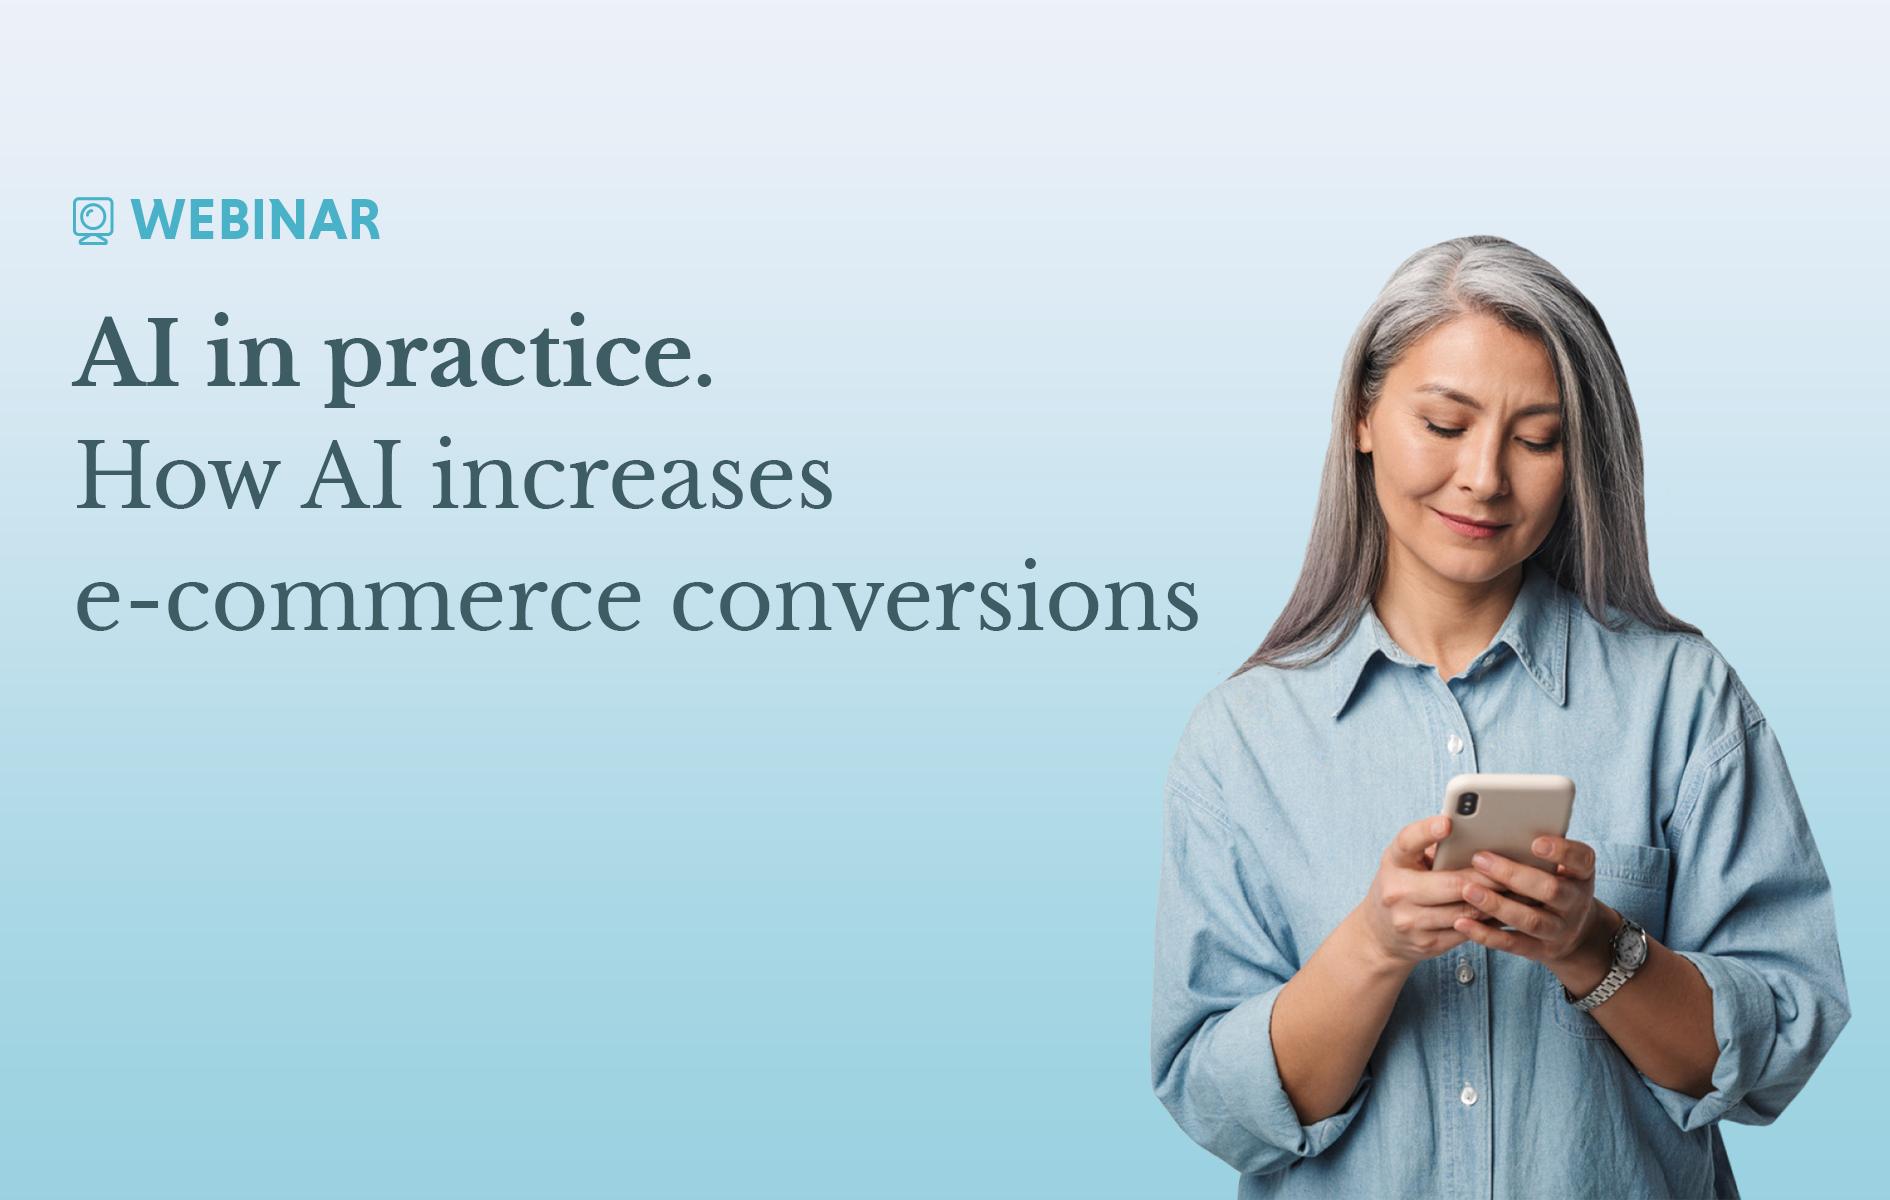 How AI increases e-commerce conversions